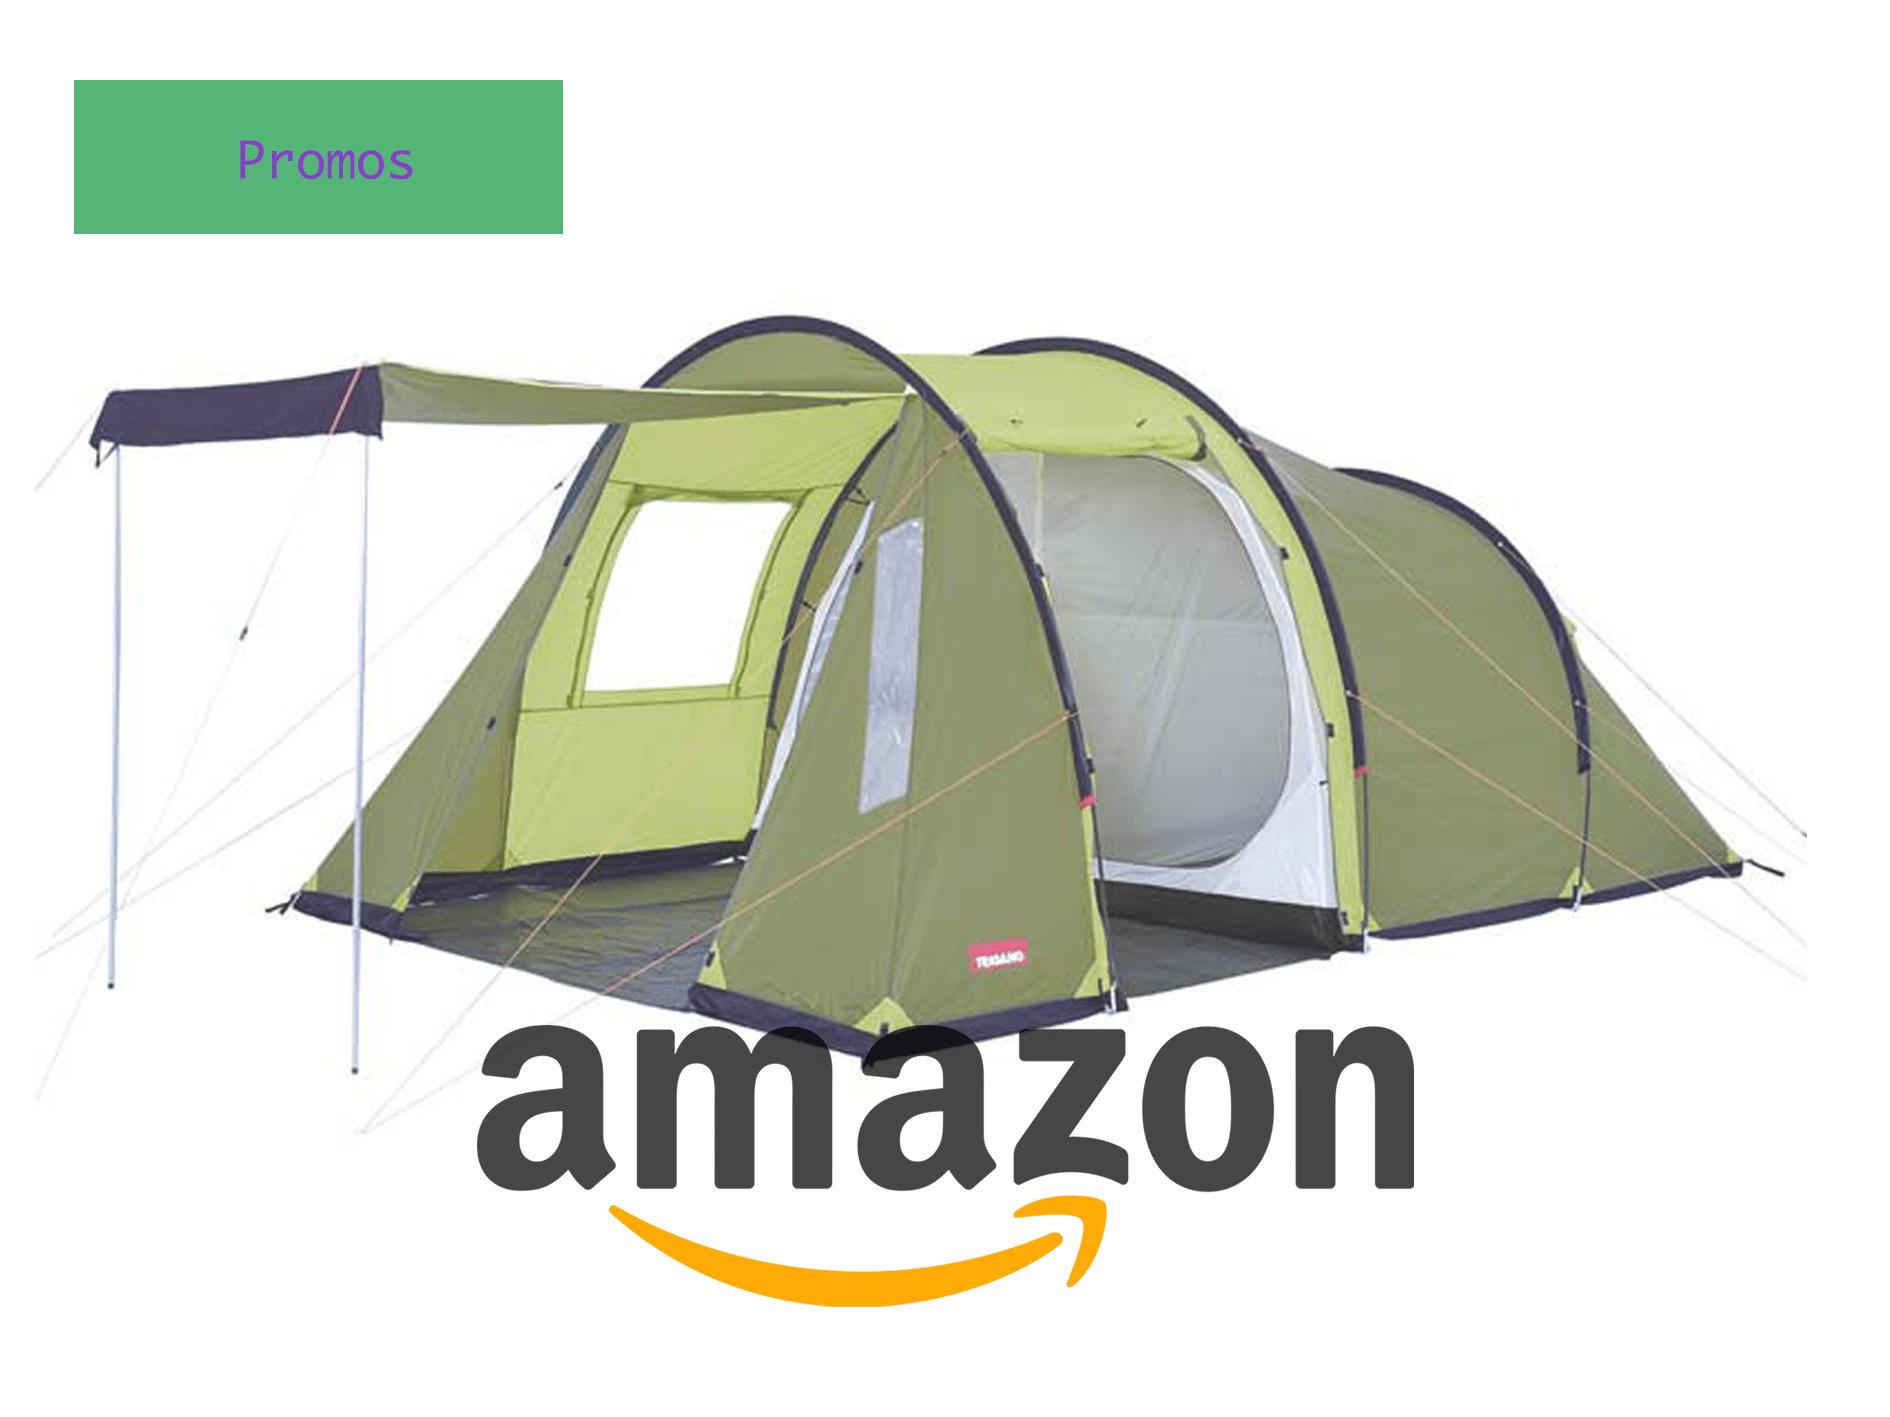 camping-amazon